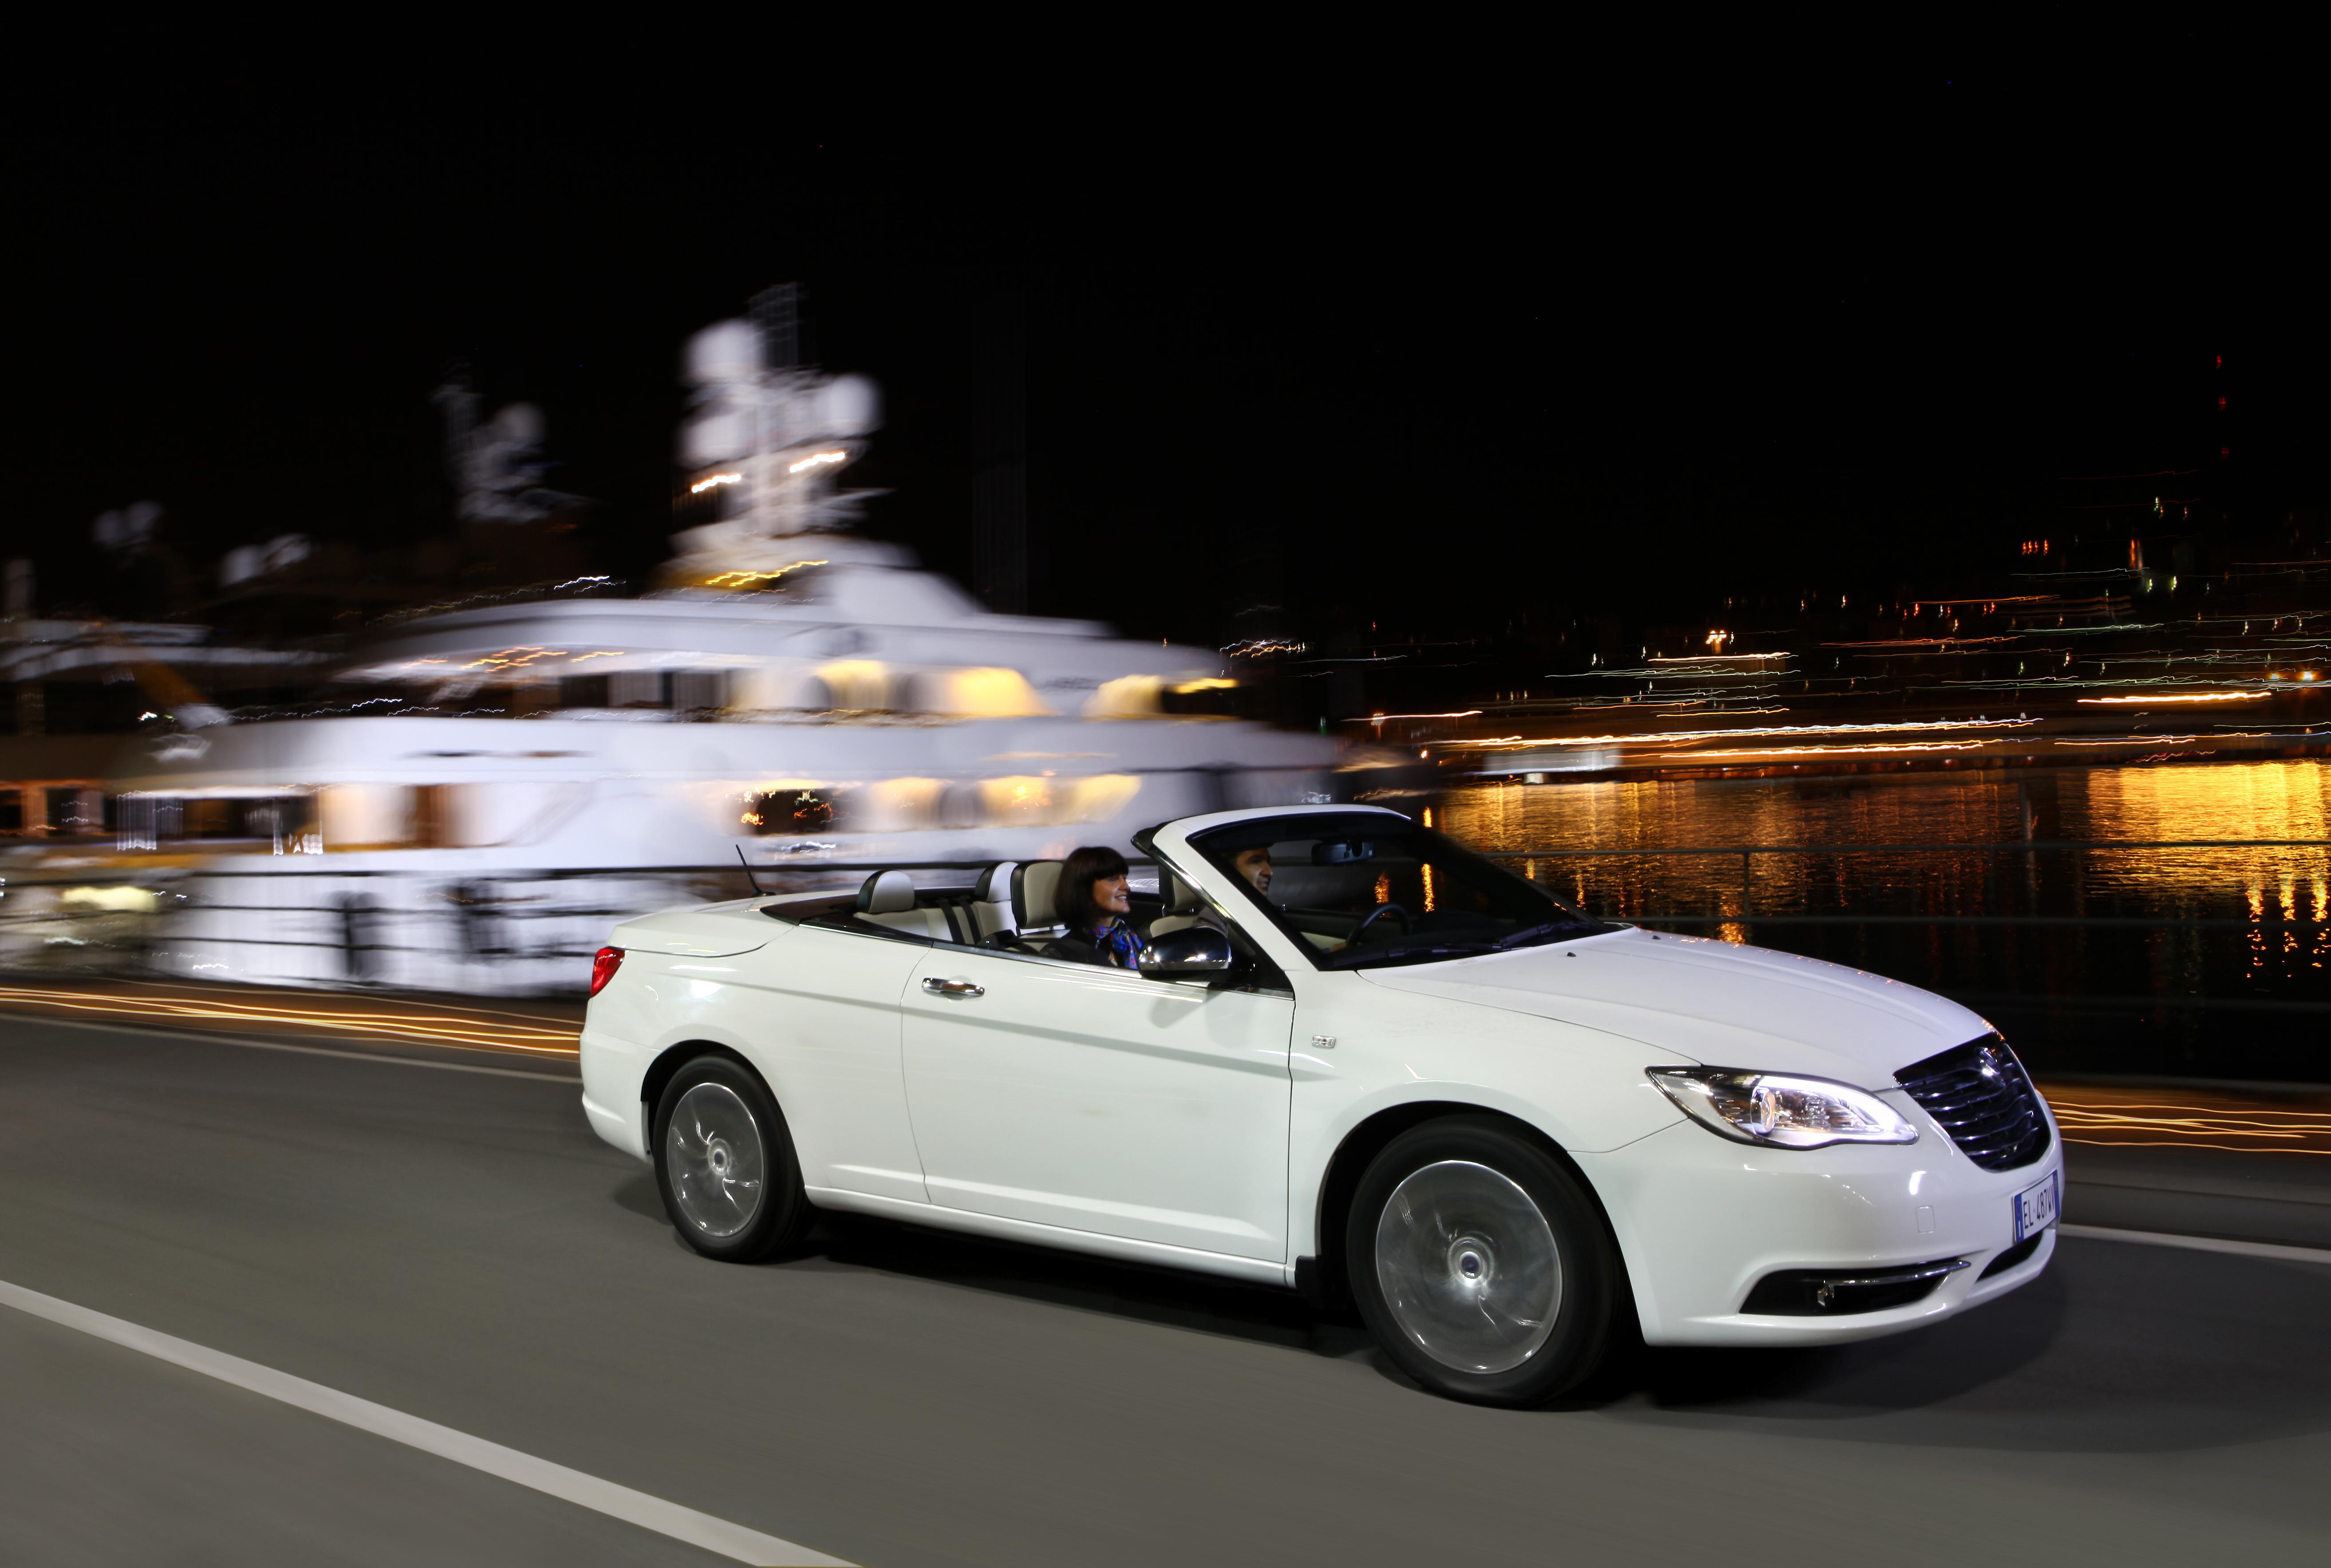 https://get.wallhere.com/photo/car-BMW-vehicle-2013-Convertible-Sedan-netcarshow-netcar-car-images-car-photo-Lancia-Flavia-land-vehicle-automotive-design-automobile-make-luxury-vehicle-personal-luxury-car-executive-car-mid-size-car-bmw-6-series-421448.jpg